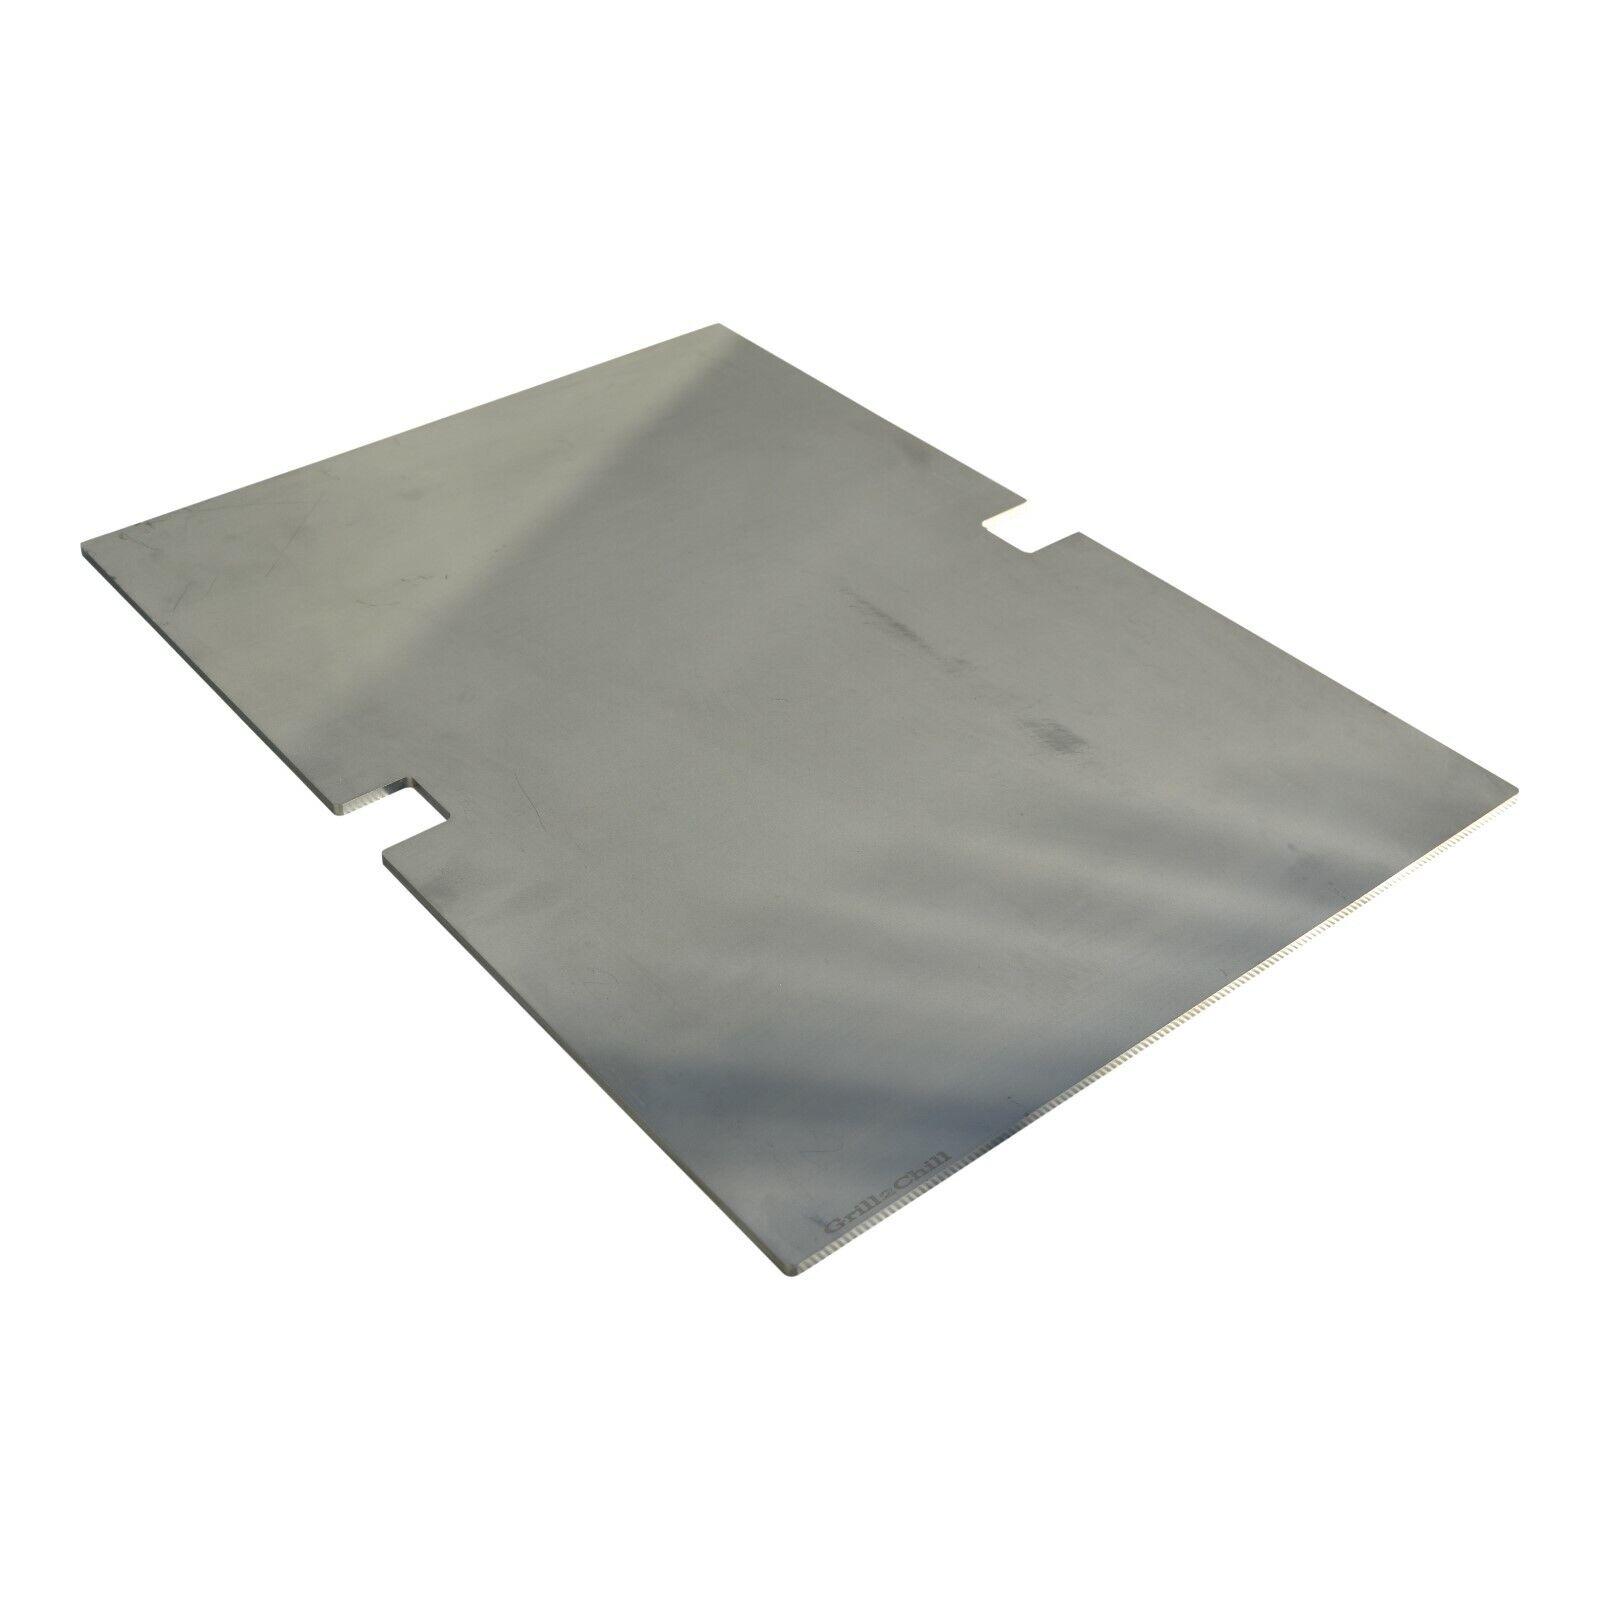 Acier Inoxydable Grill Plaque plancha v2a pour Weber Spirit e-210 + eo-210 + SPIRIT II